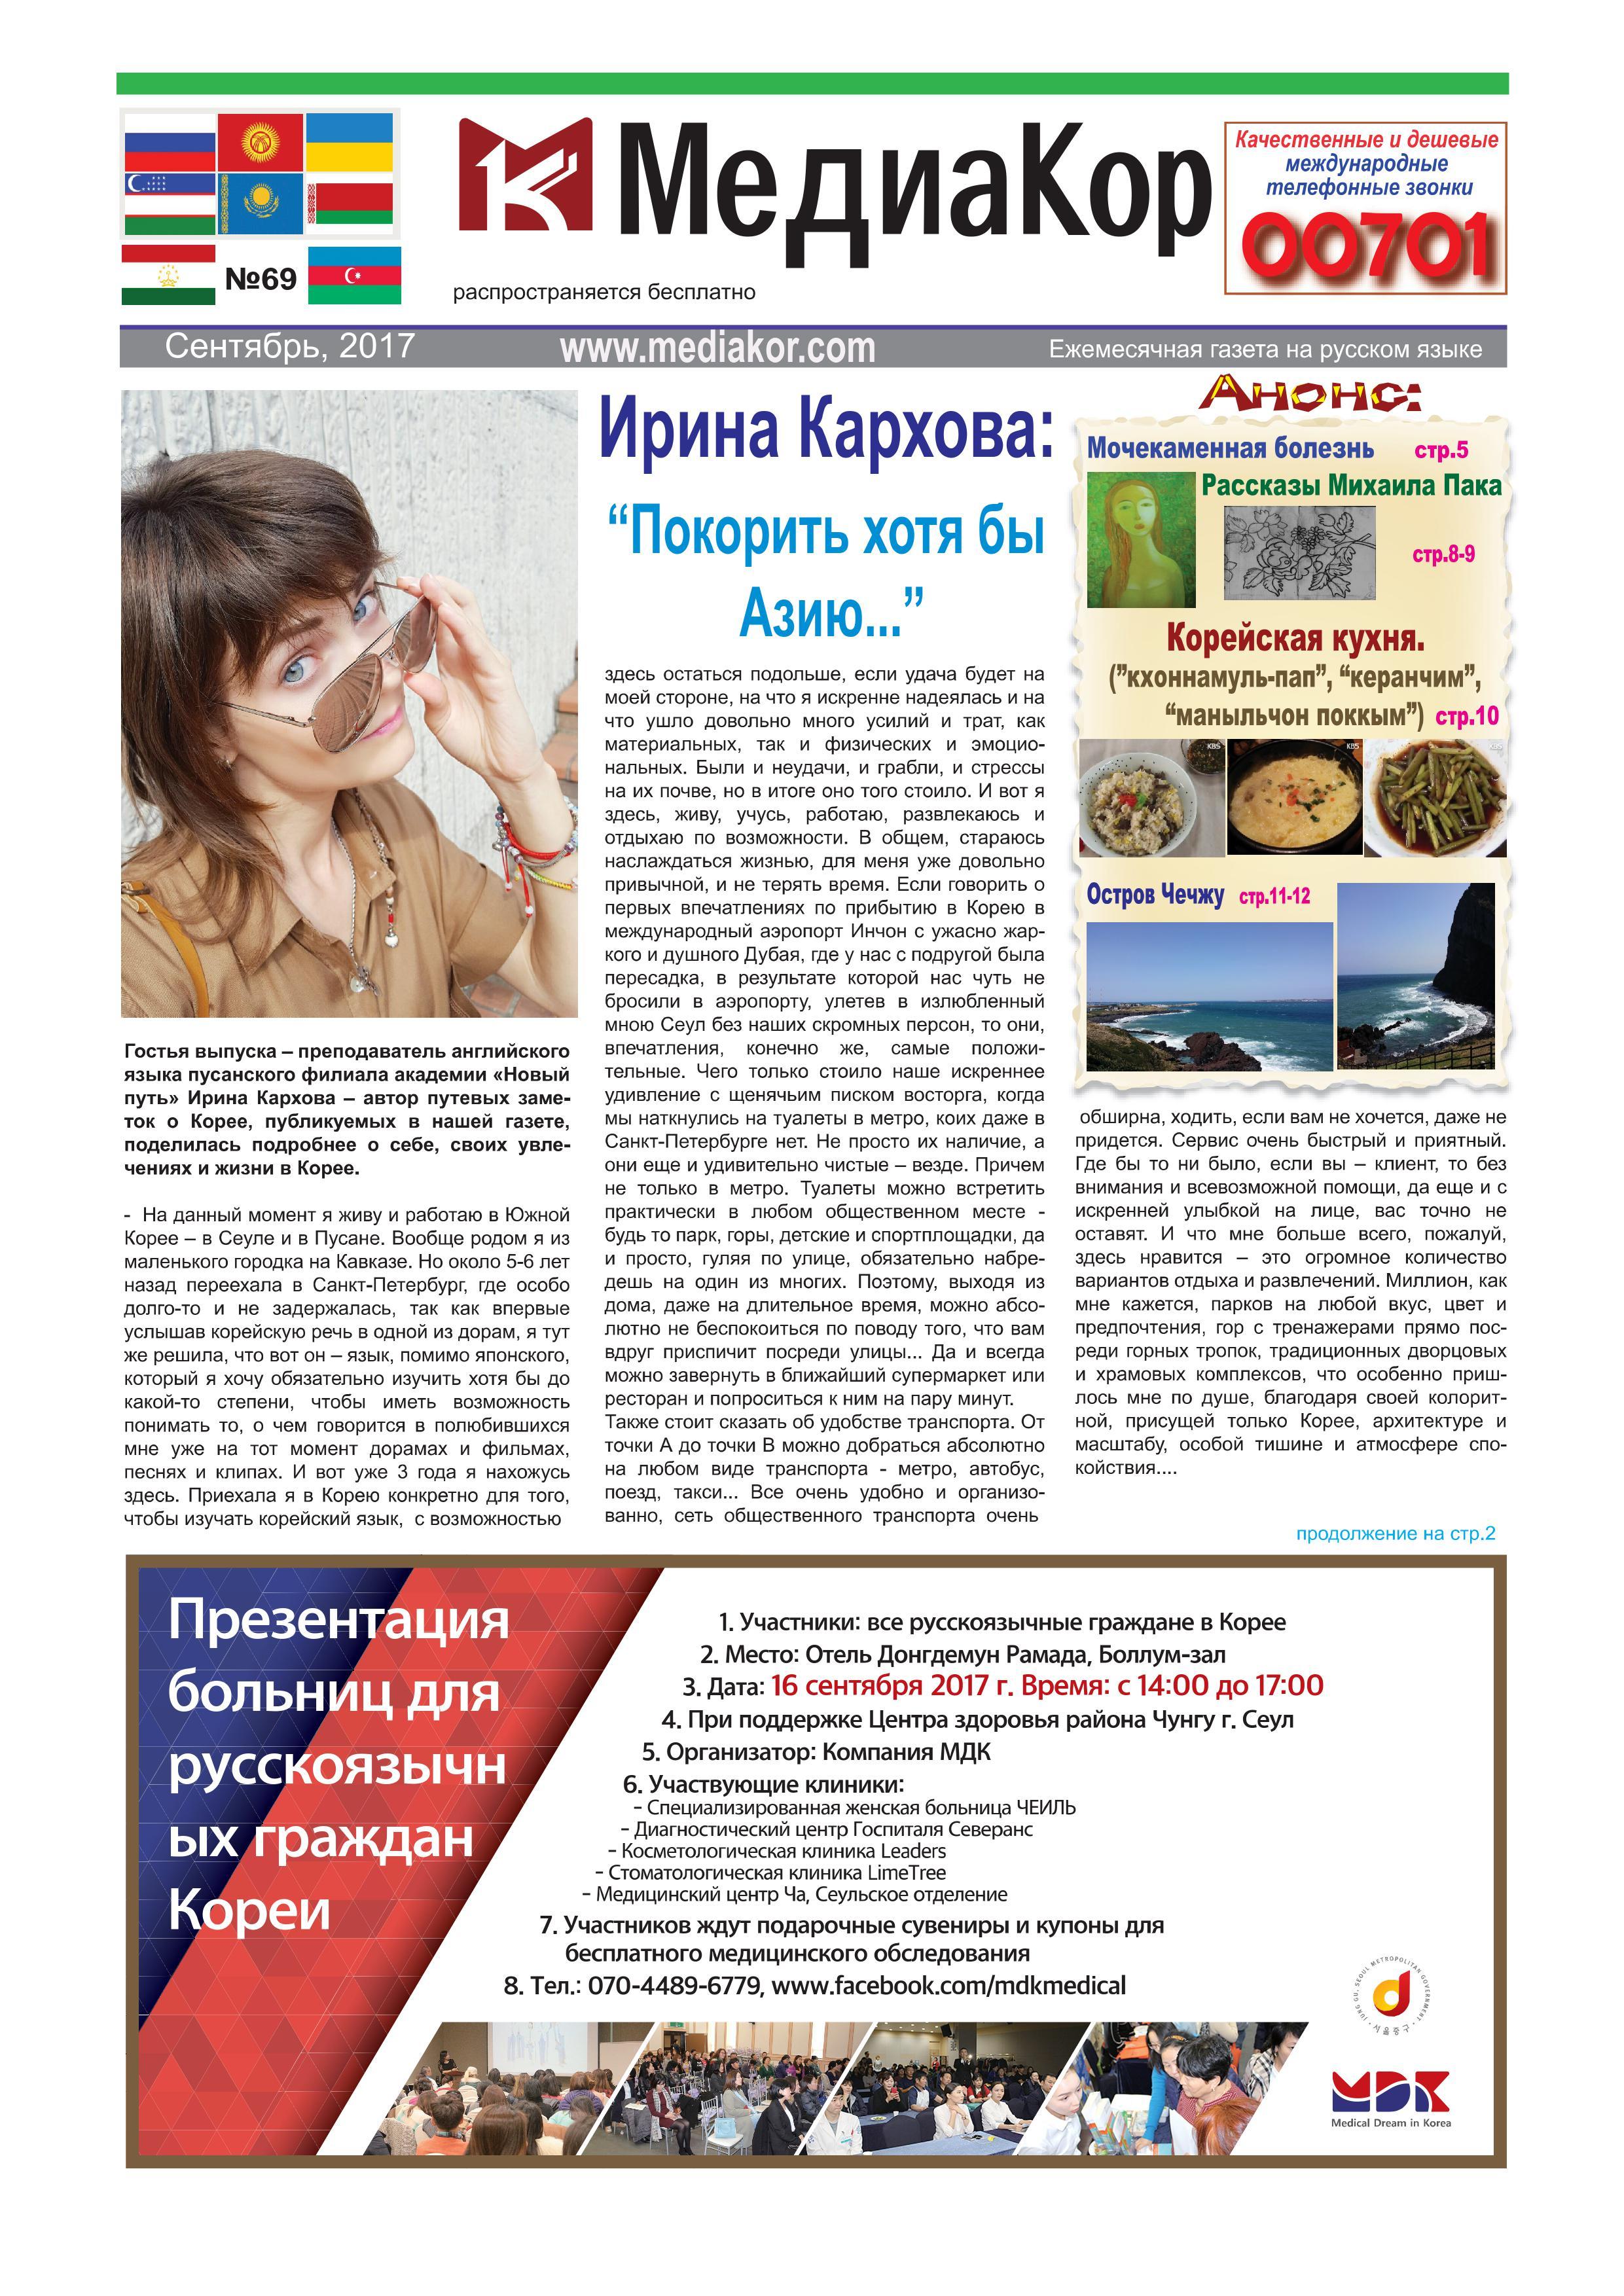 MDAwMSAoMSk~.jpg